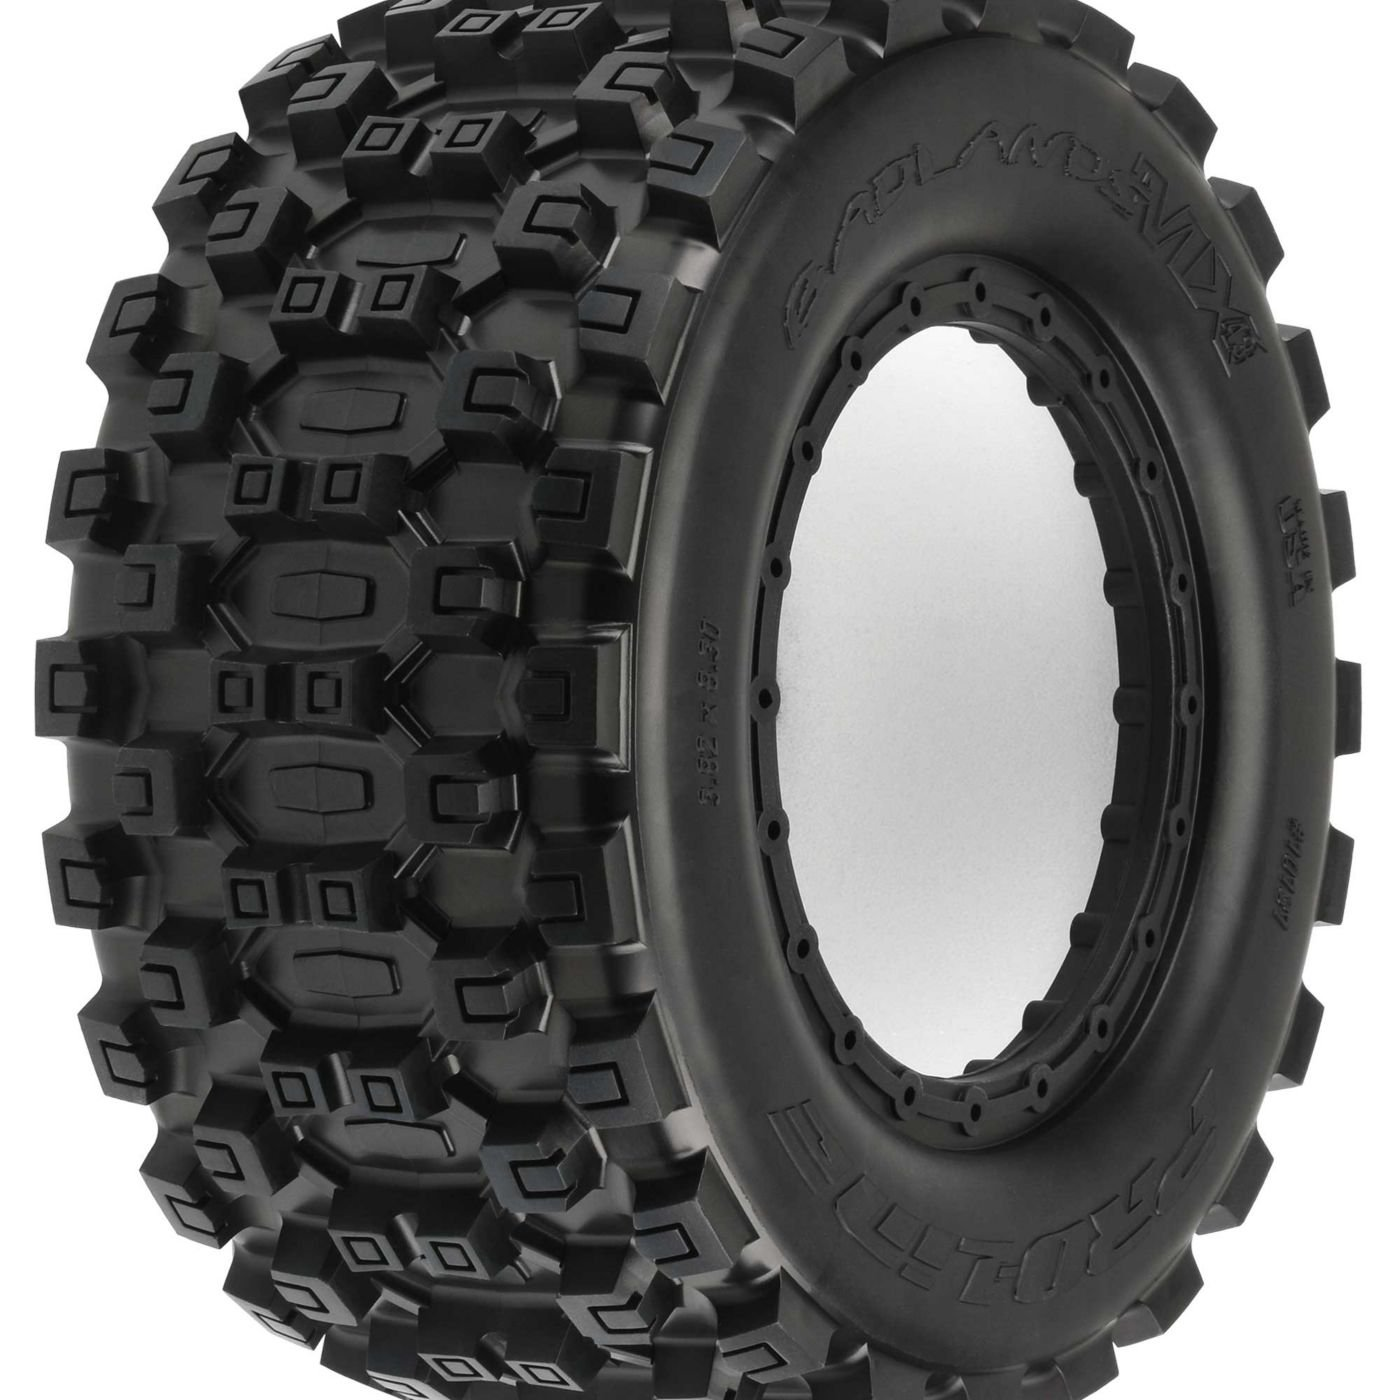 Pro-line Racing Badlands MX43 Pro-Loc Tire(2) Pro-Loc X-MAXX Wheel, PRO1013100